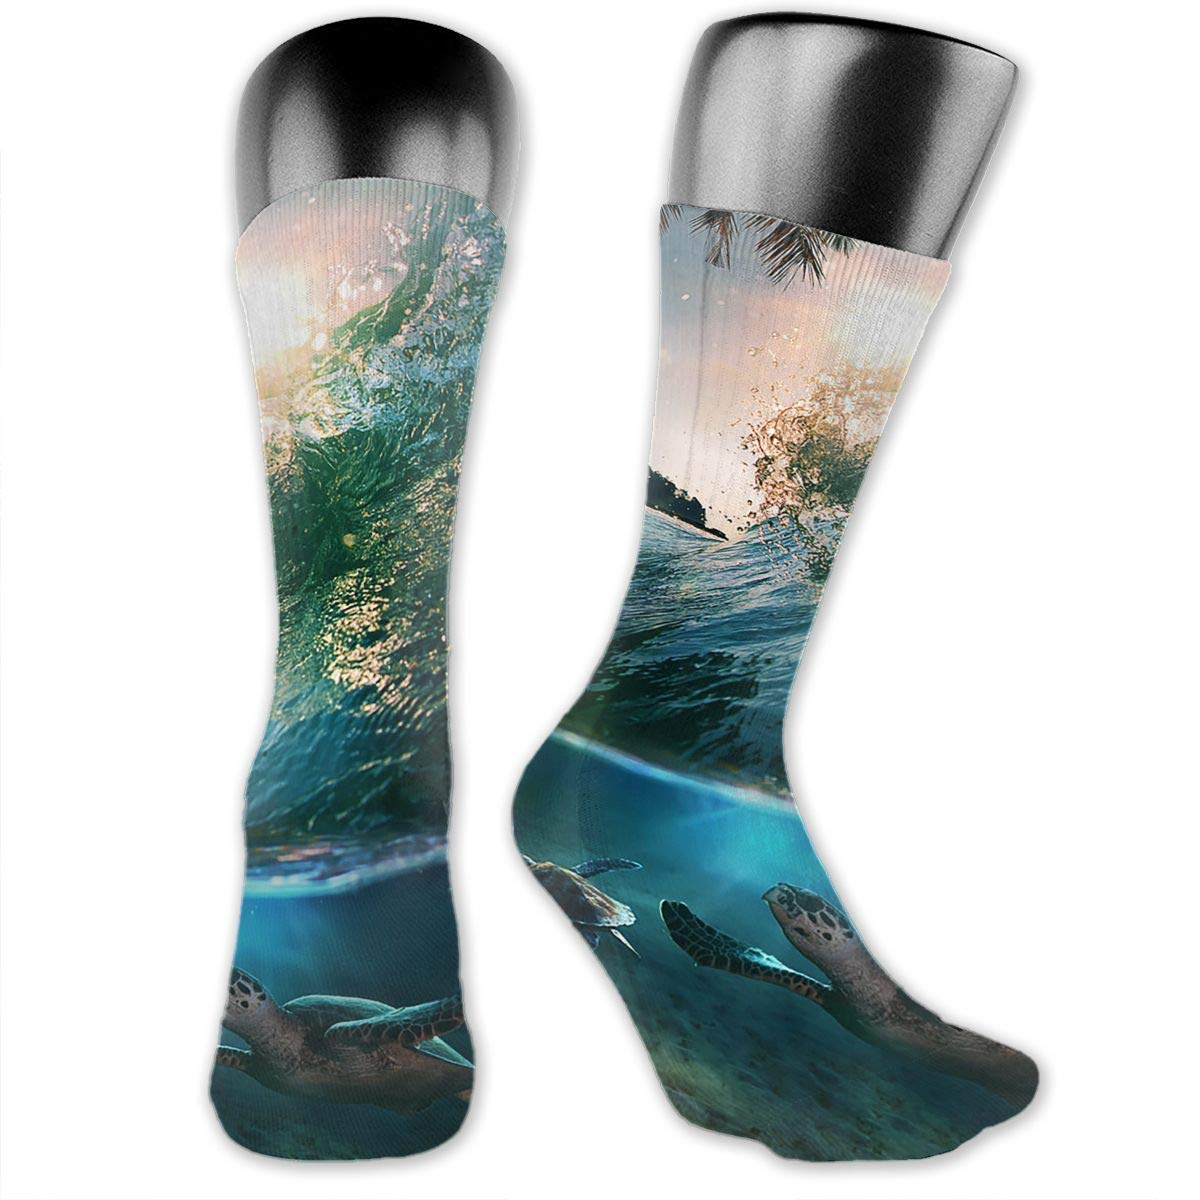 Sea Turtles Under The Sea Women Dress Socks Fun Crew Socks 15.7